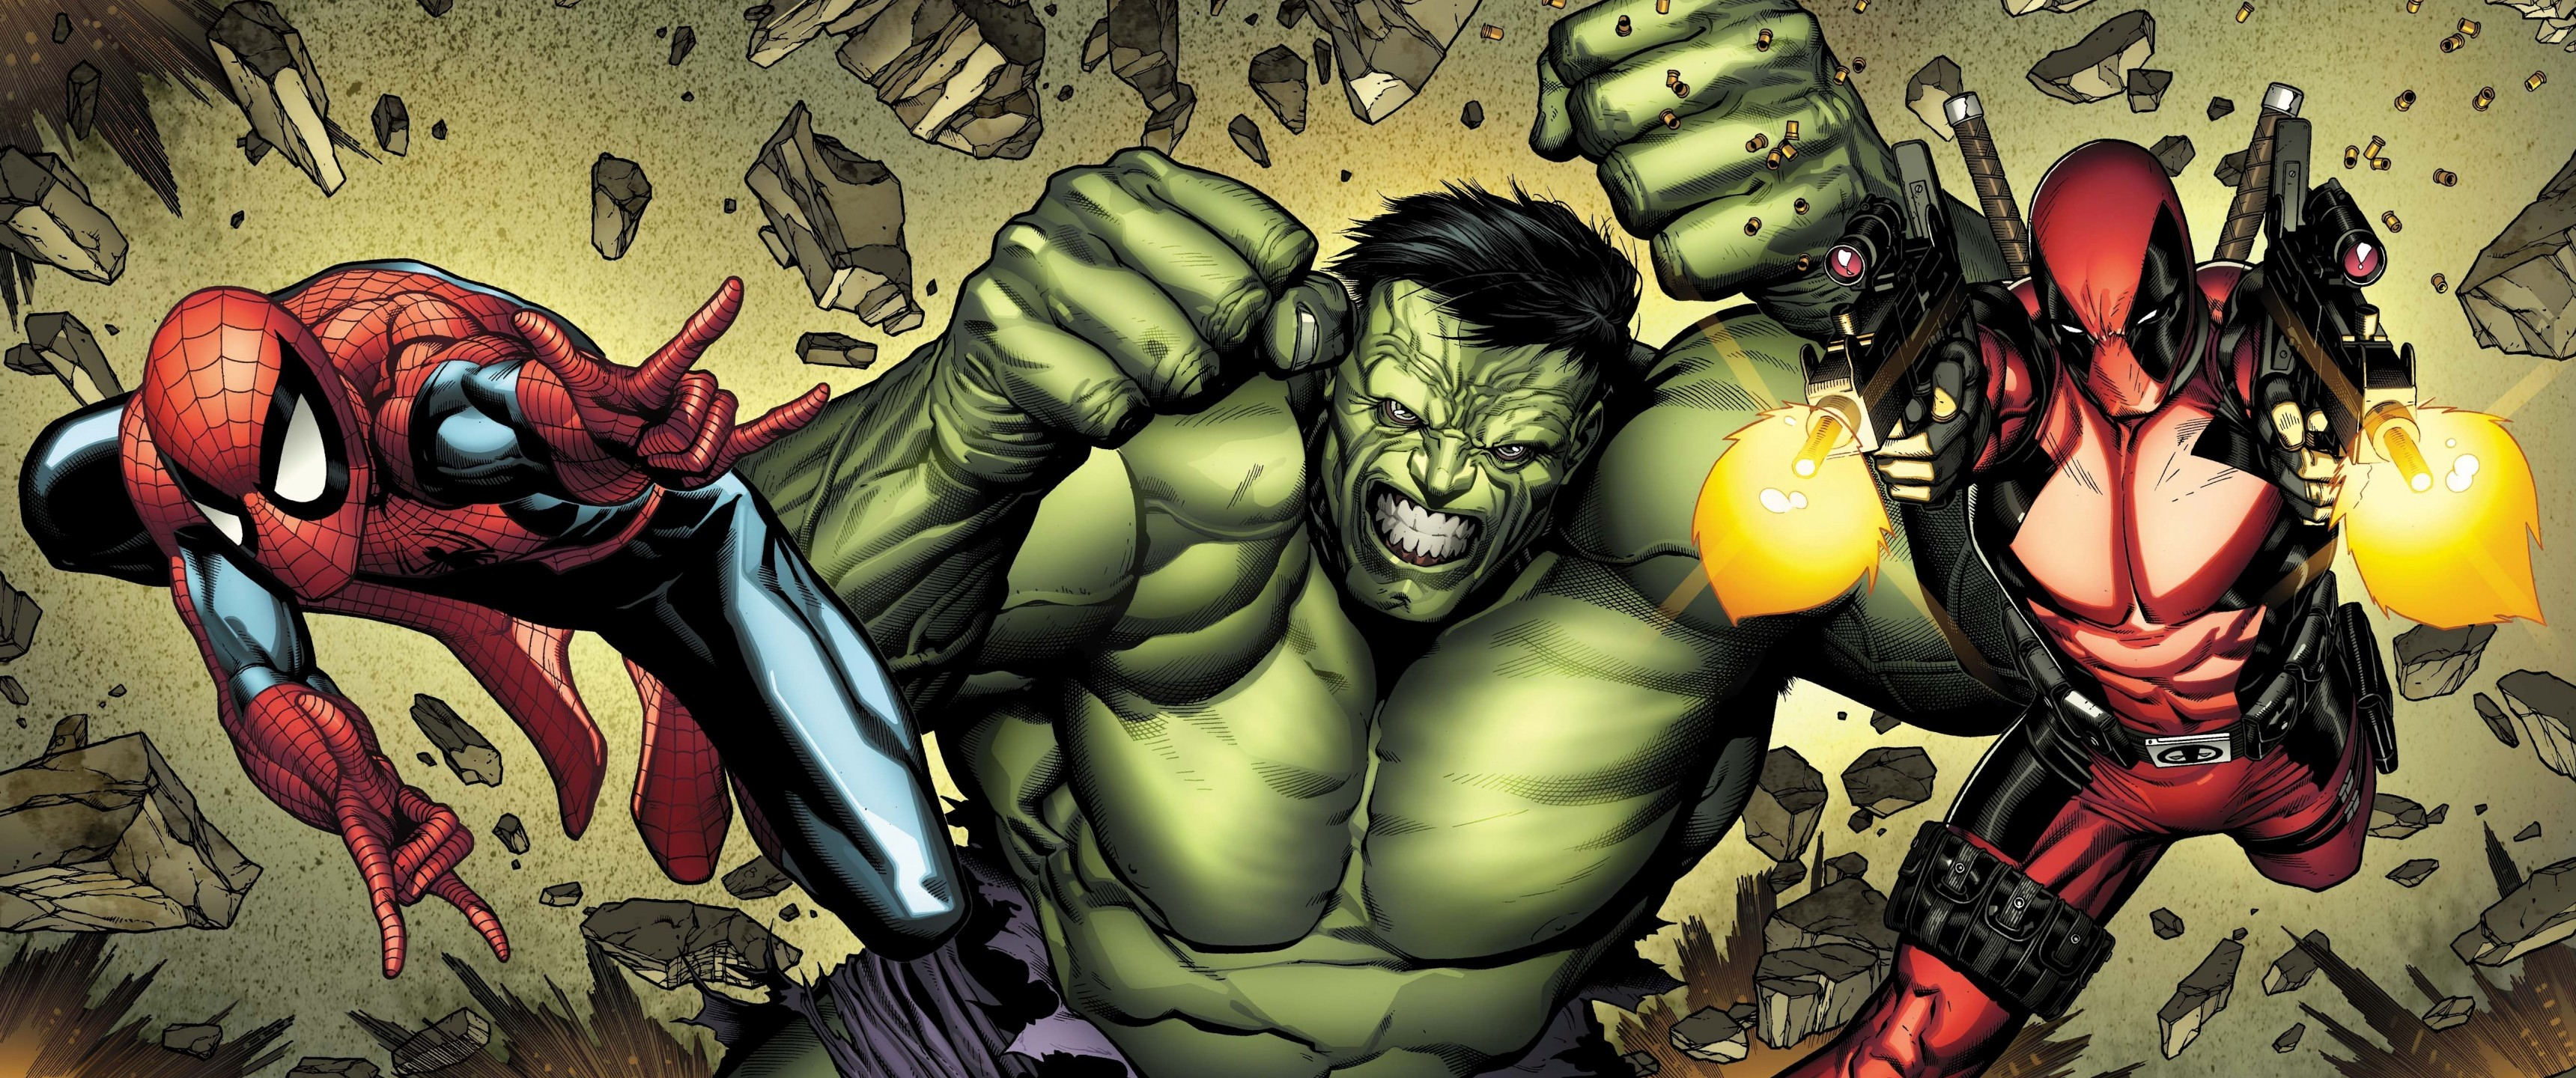 Hulk, Spider-man, Deadpool, Comics, Artwork, Marvel